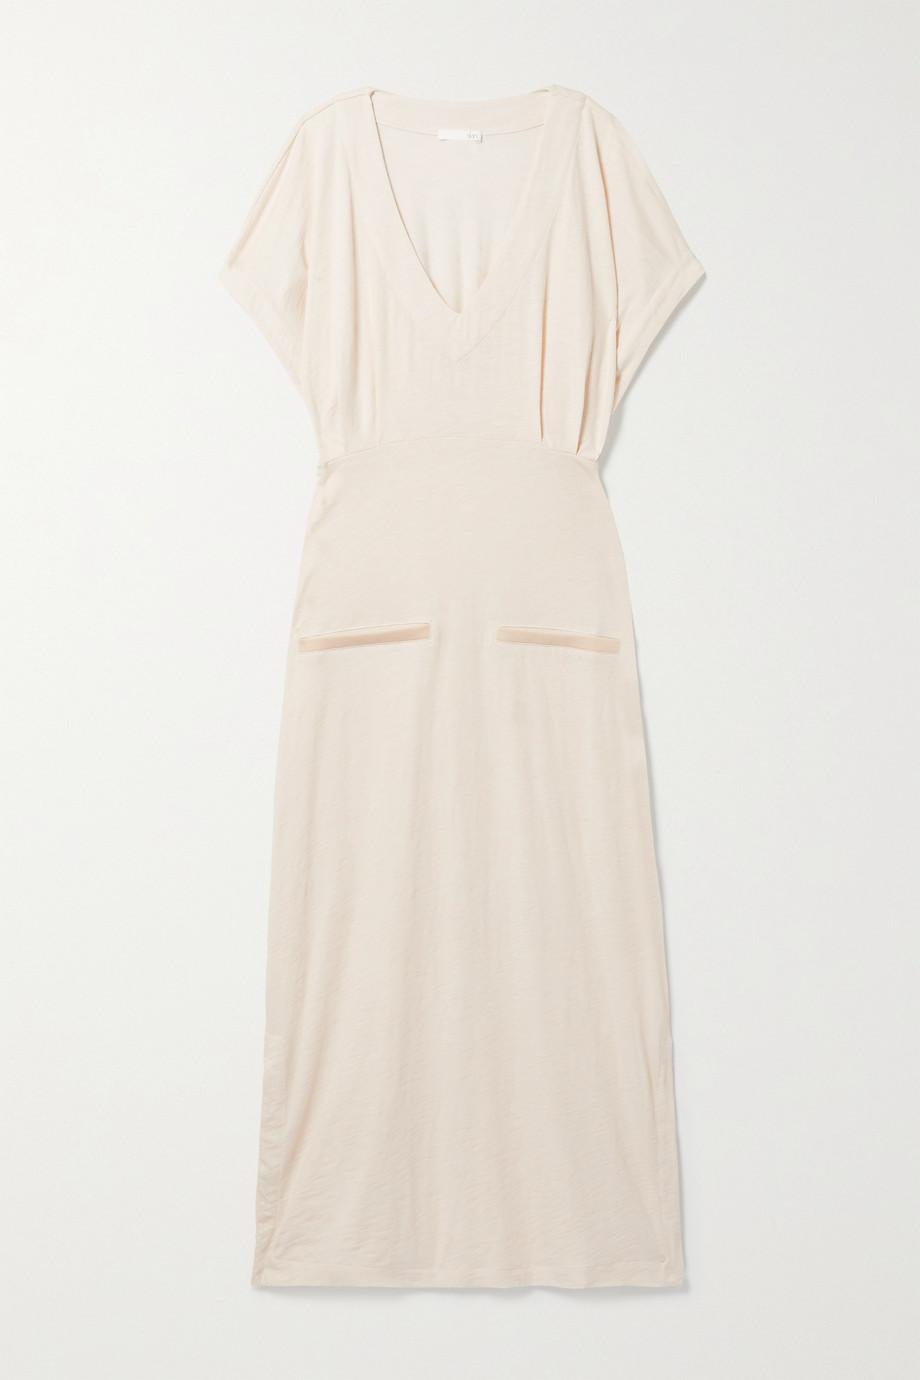 Skin + NET SUSTAIN Farida organic cotton-blend jersey nightdress